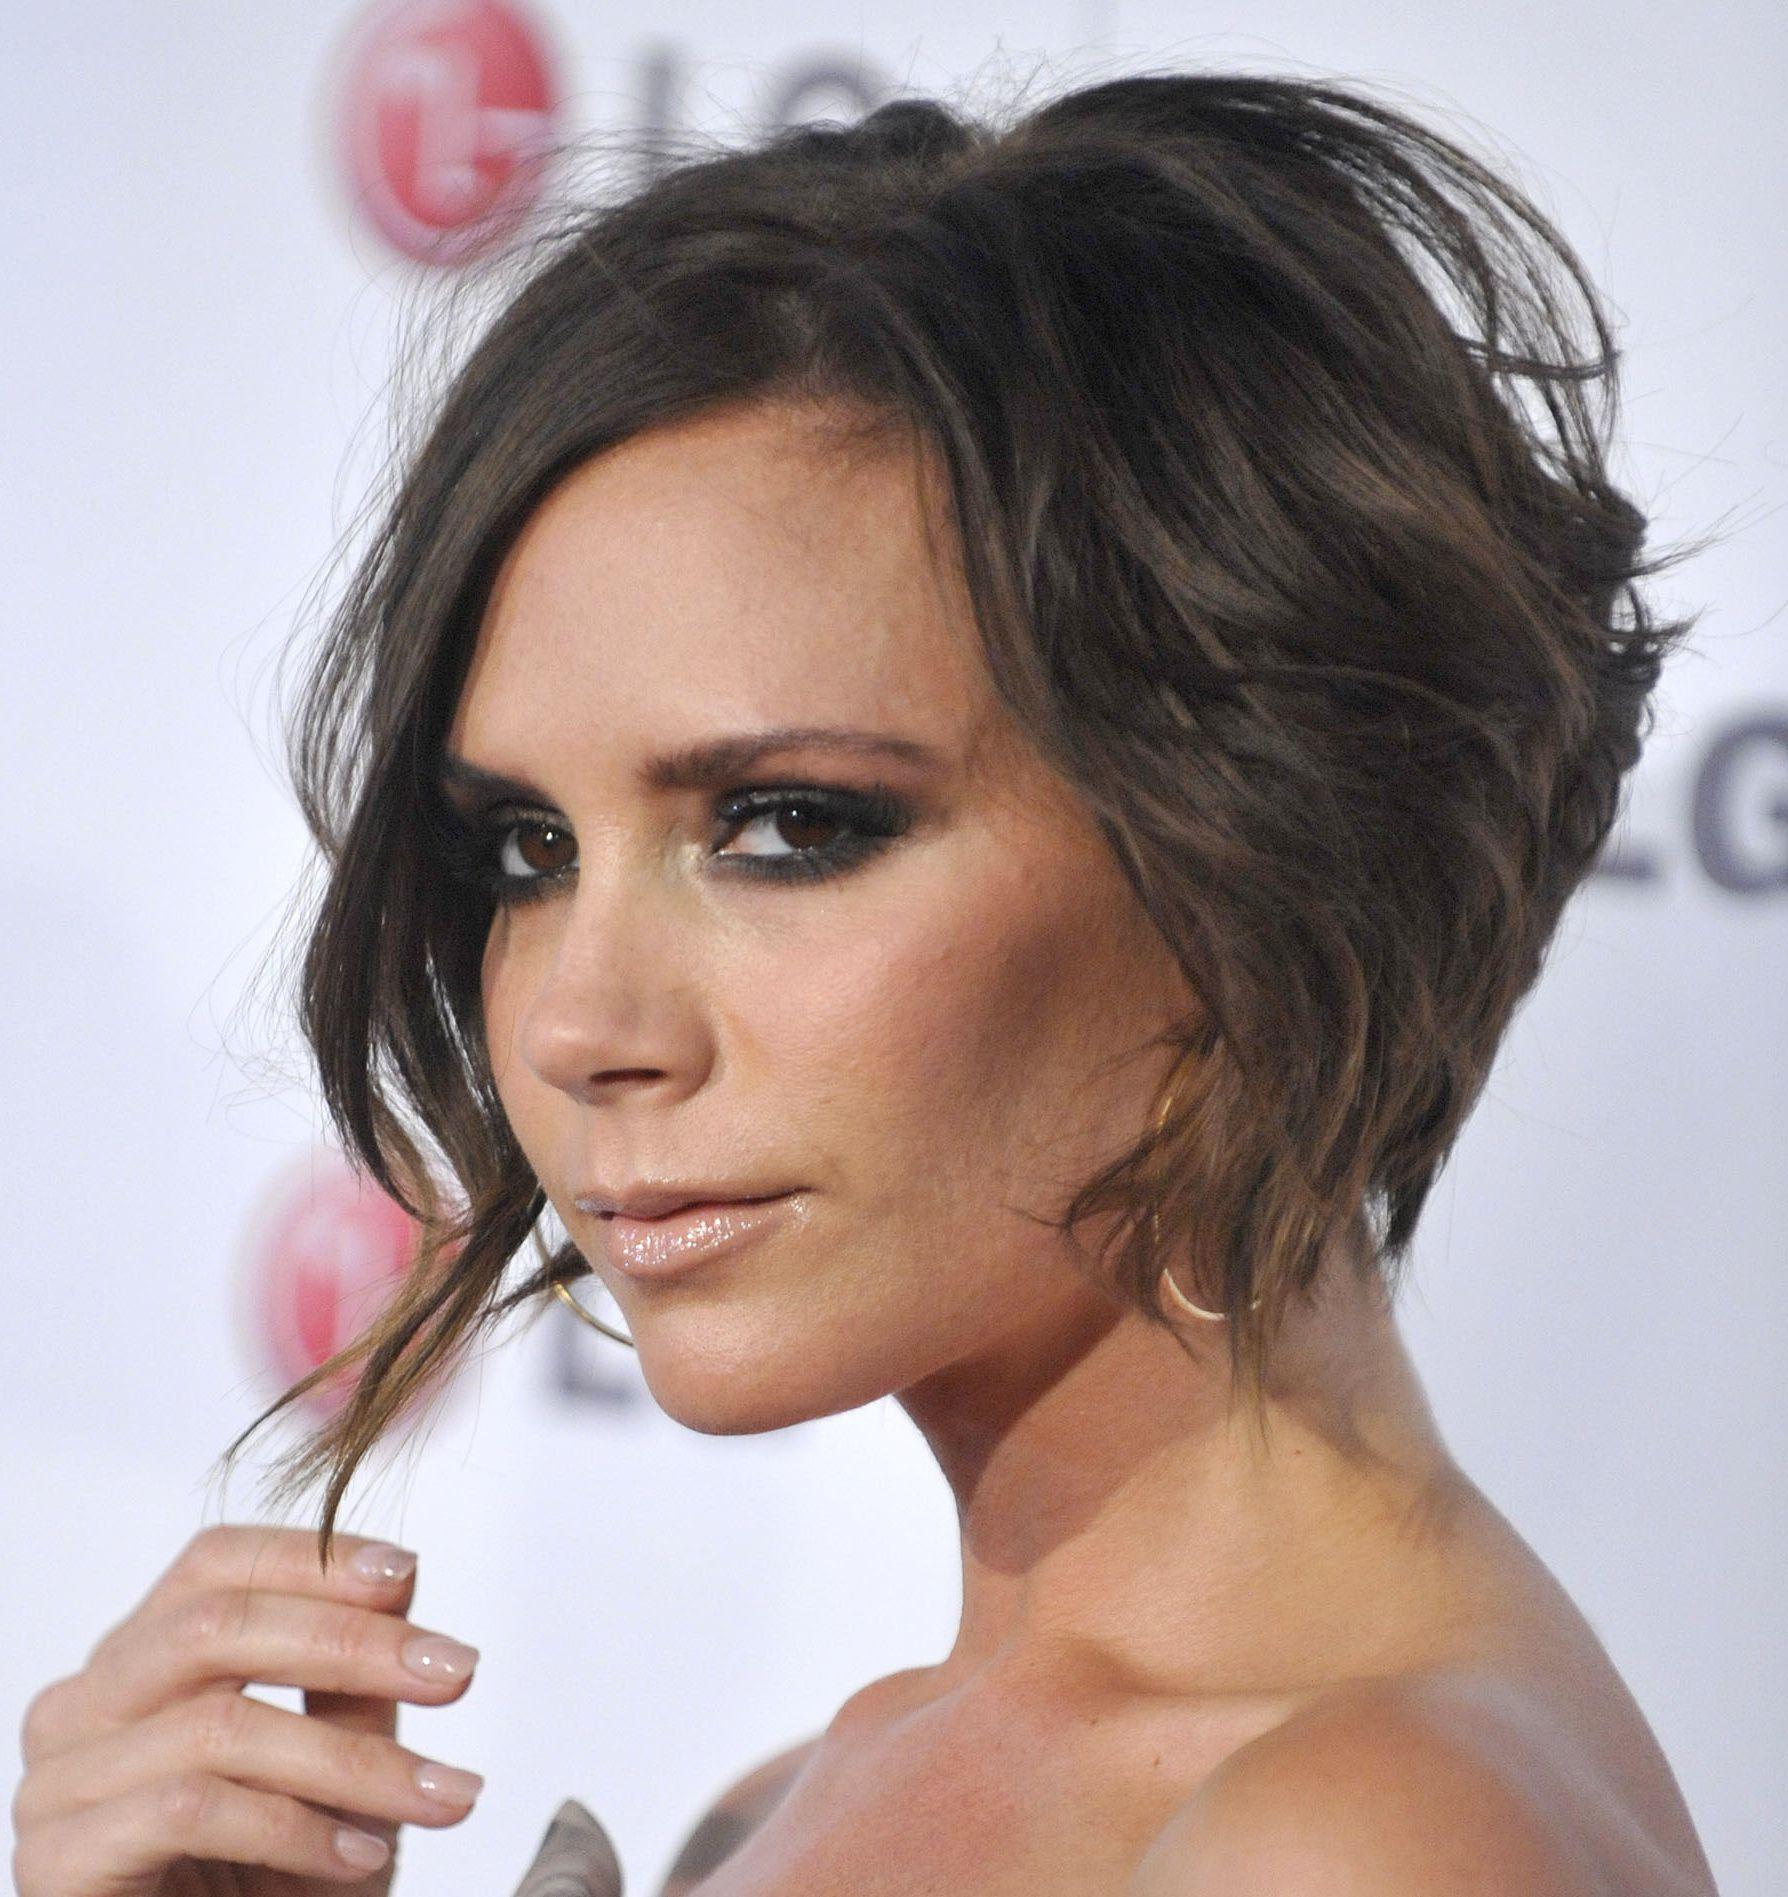 Slideshow: Celebrities With Short Hair